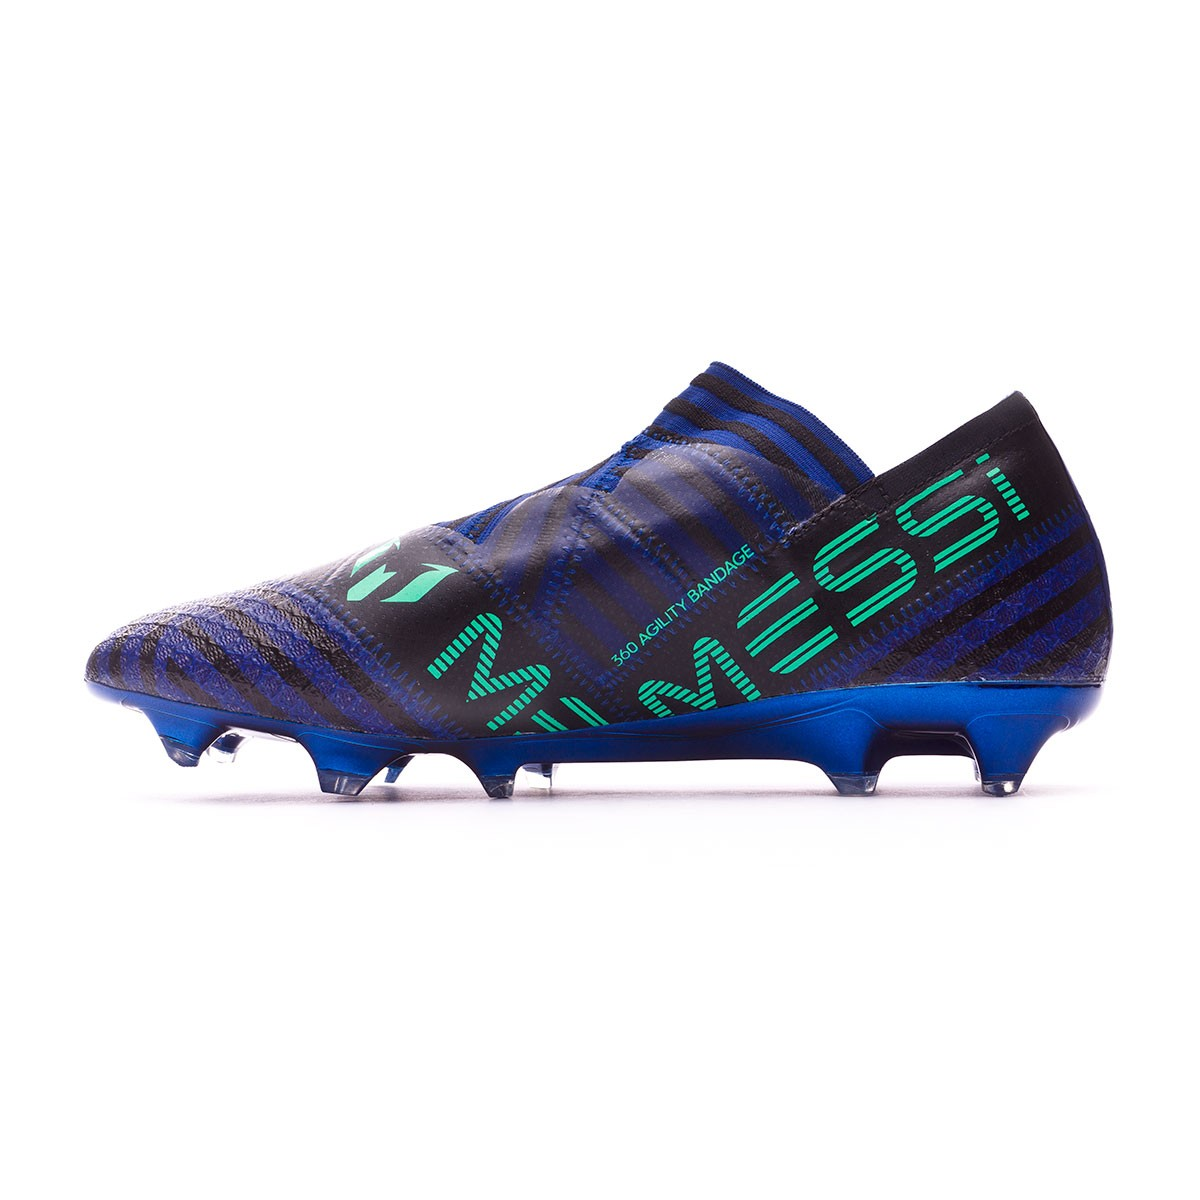 e0ee8e61728b Football Boots adidas Nemeziz Messi 17+ Agility FG Unity ink-Hi-res green- Core black - Football store Fútbol Emotion